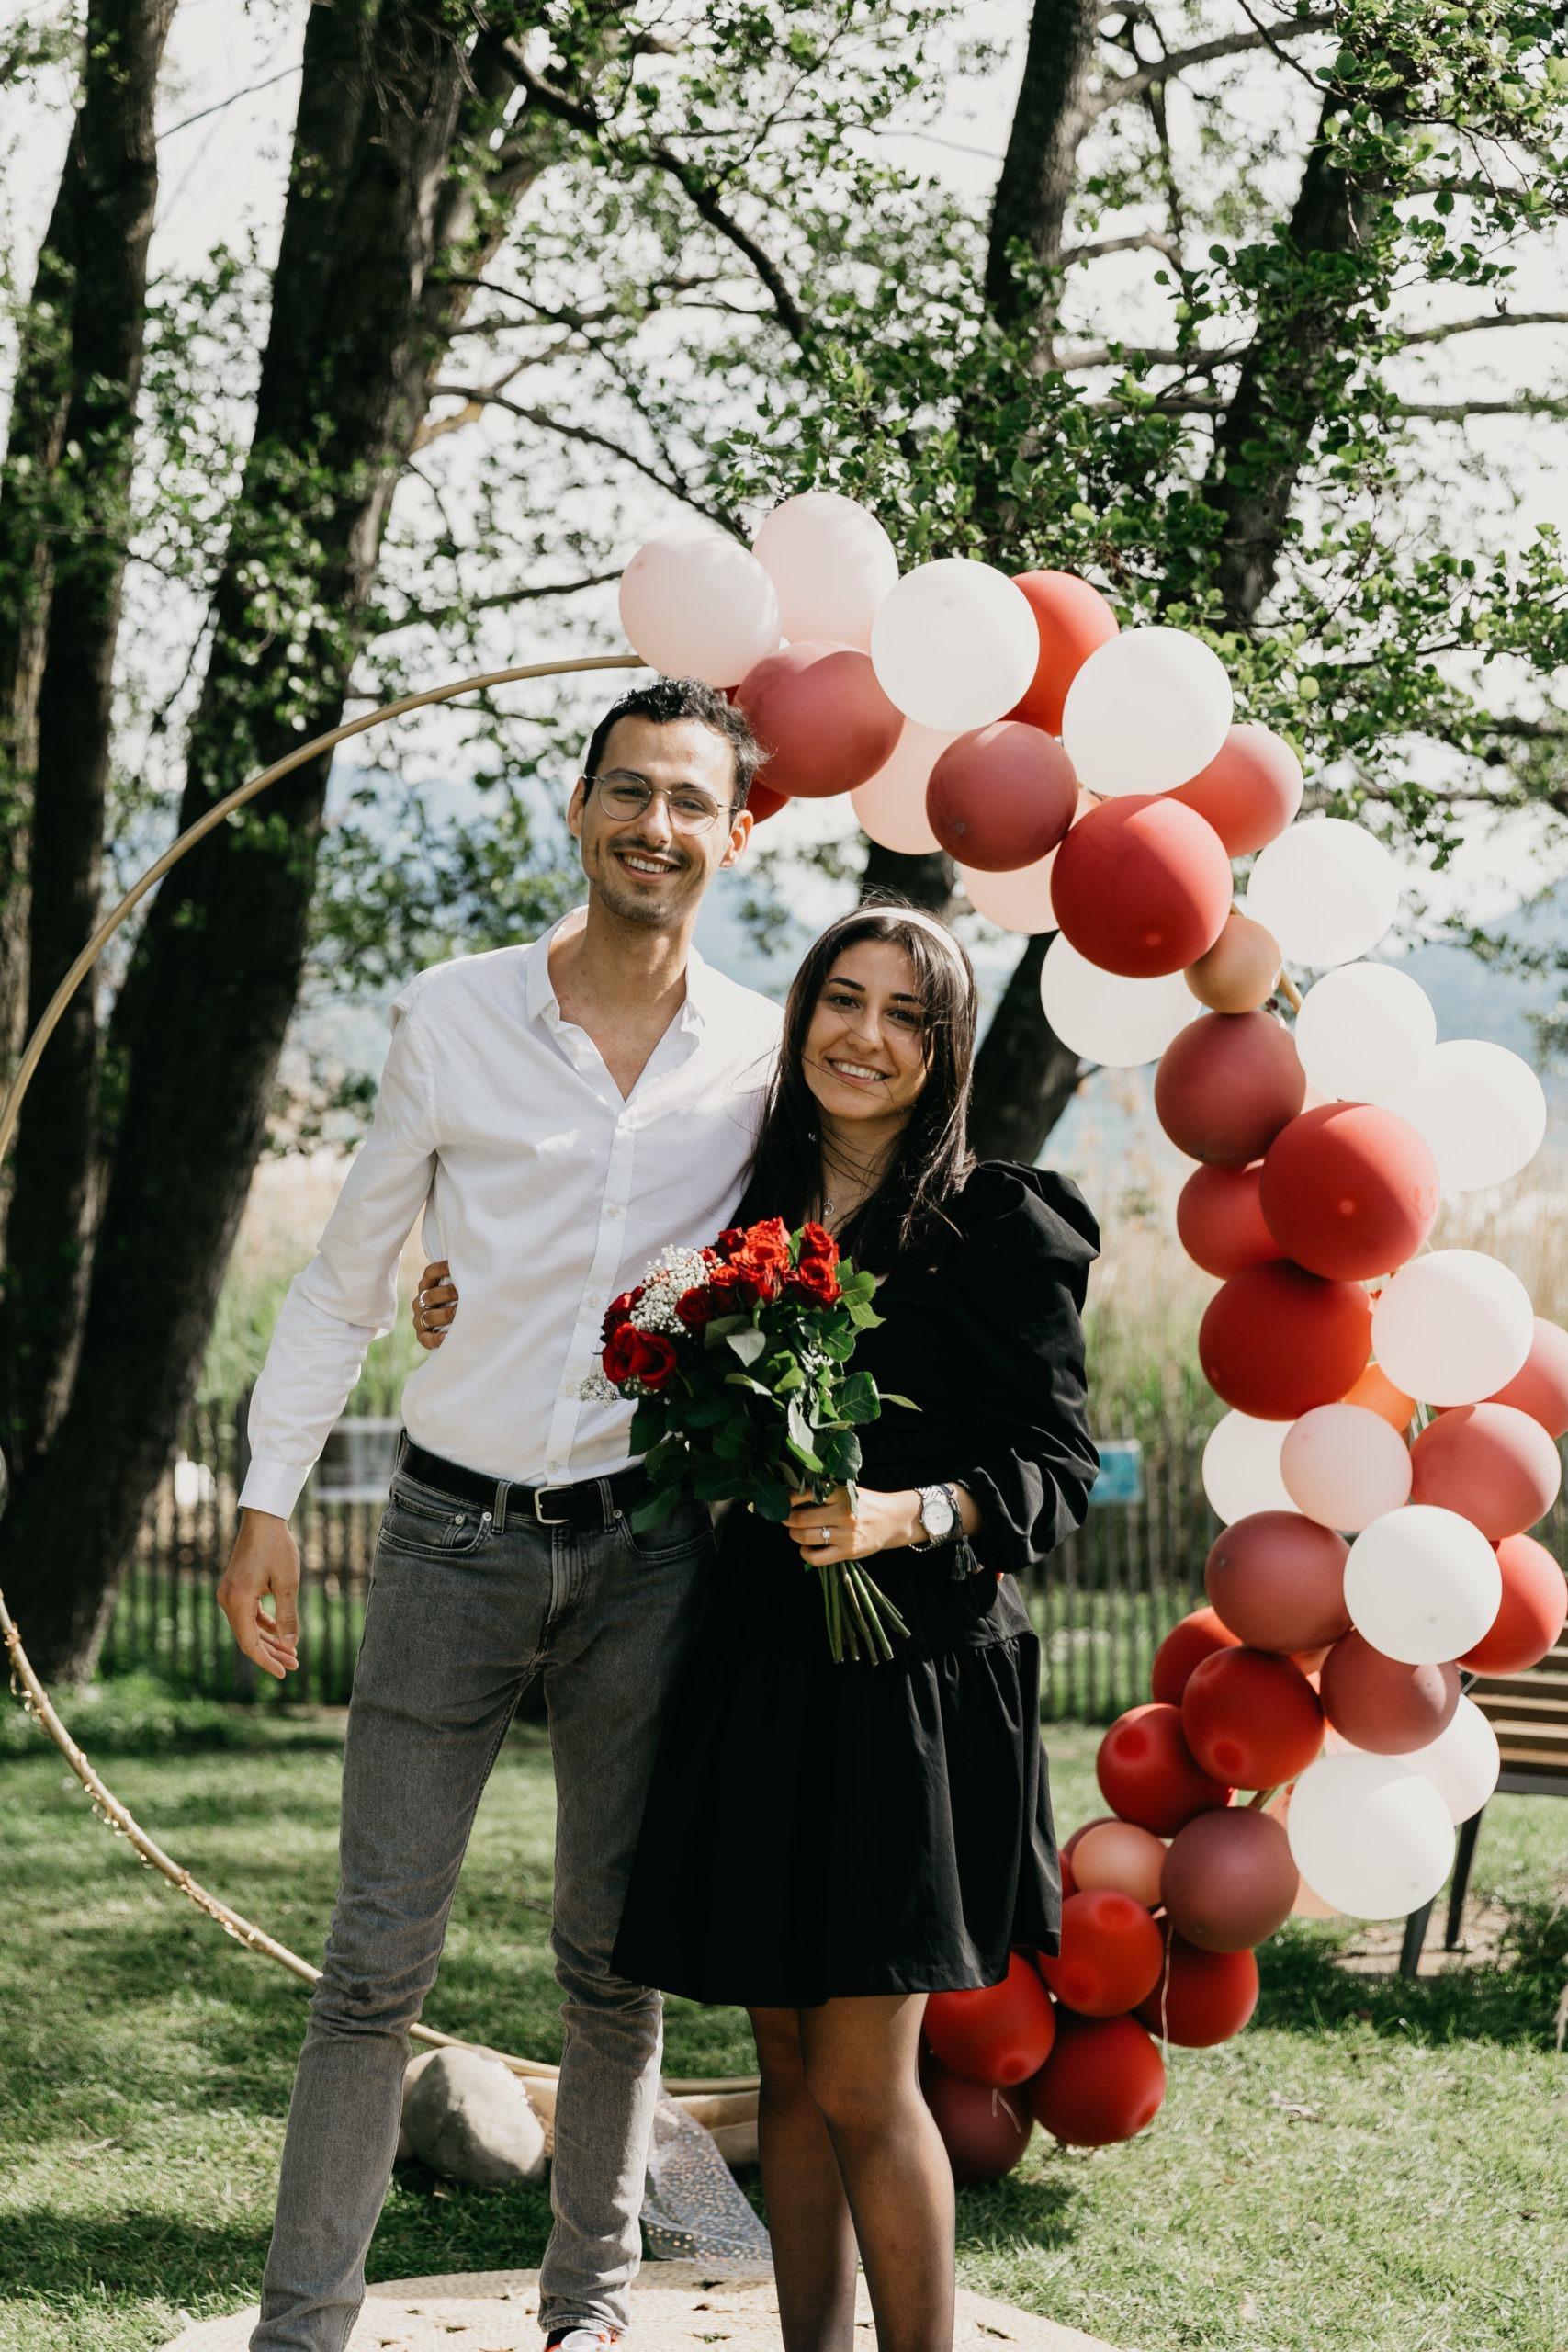 demande en mariage - les moments m - wedding planner lyon